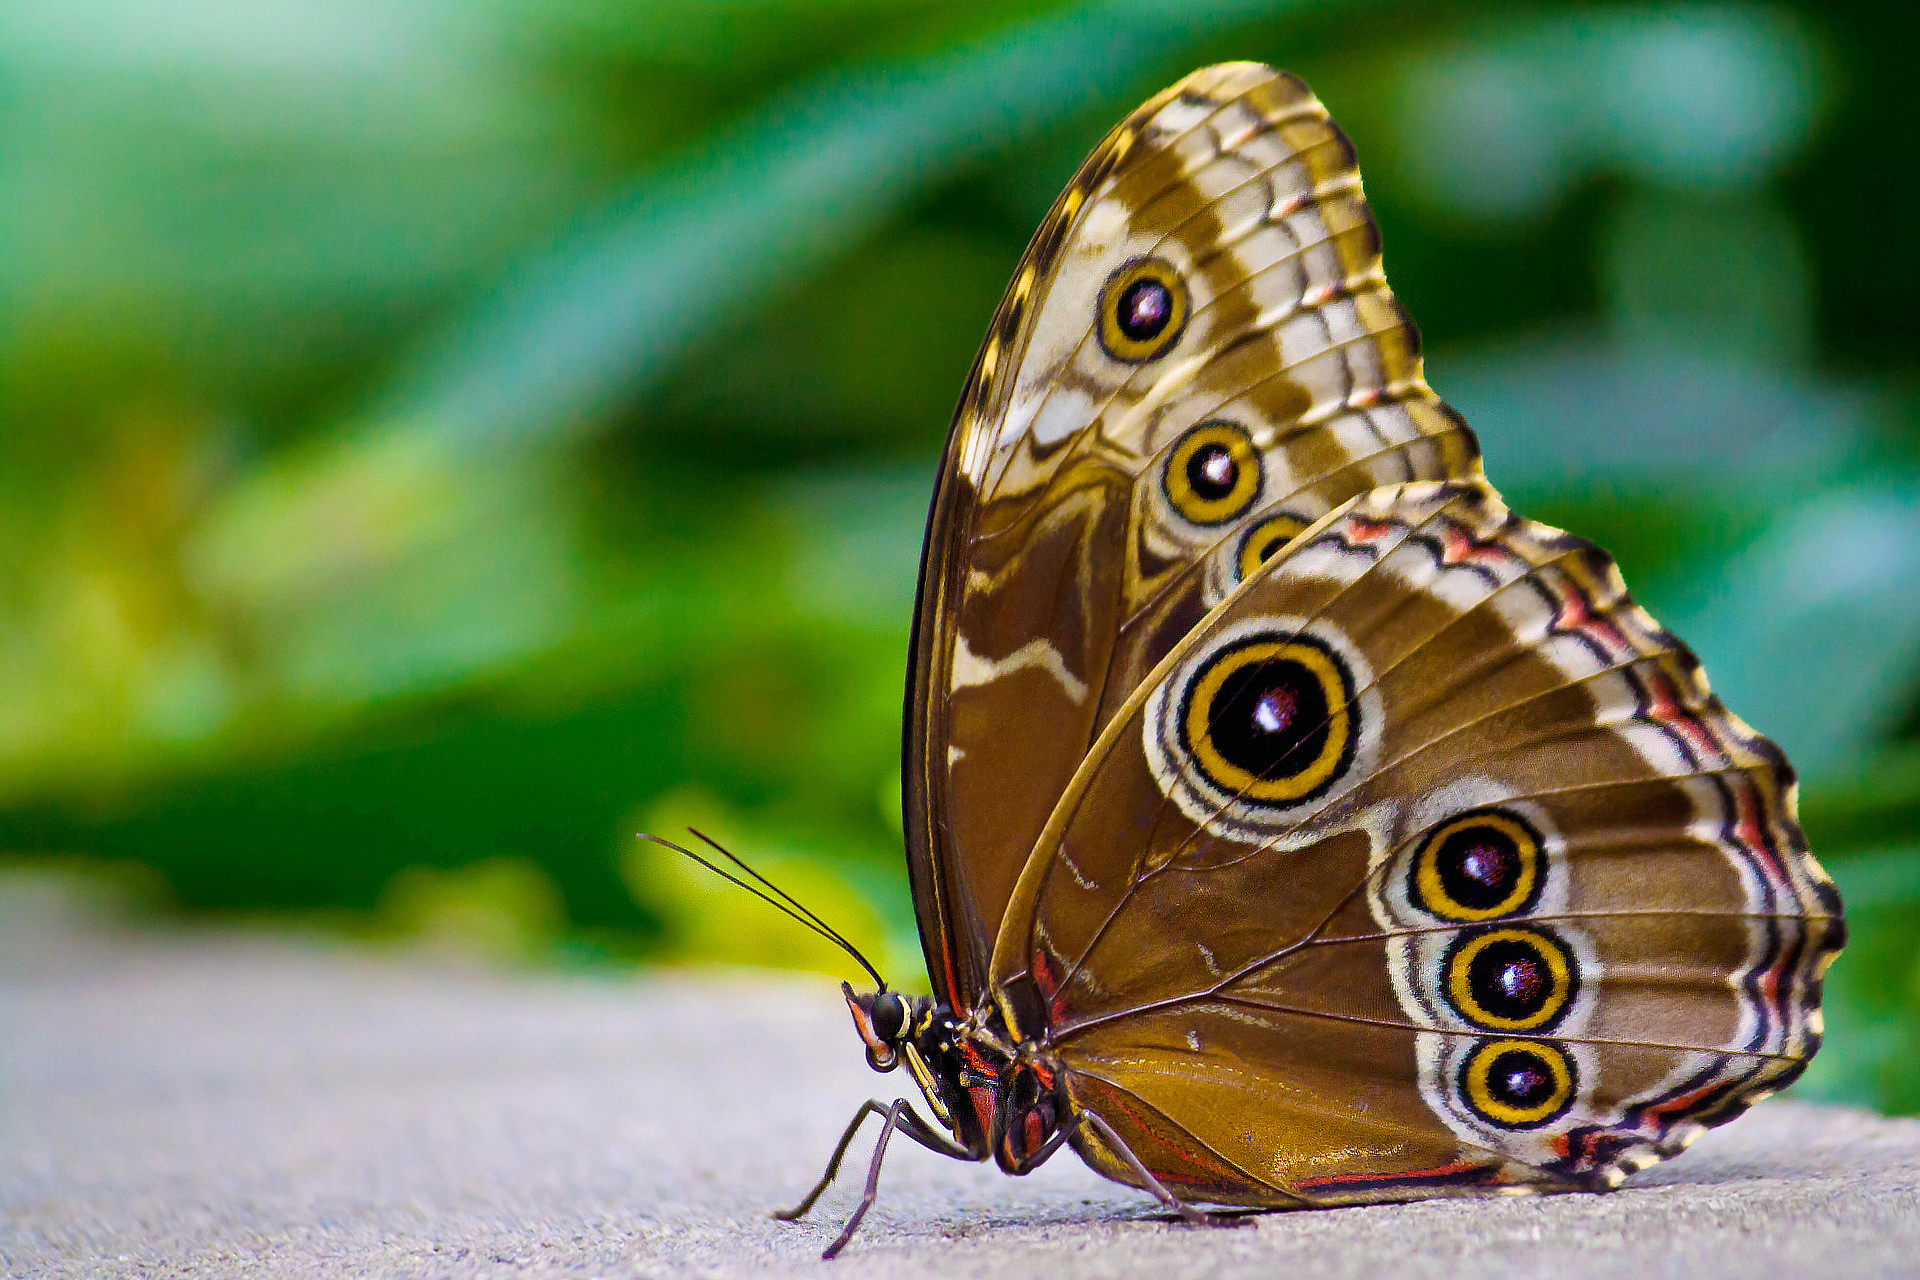 Colourful Iphone X Wallpaper Schmetterlinge Full Hd Wallpaper And Hintergrund